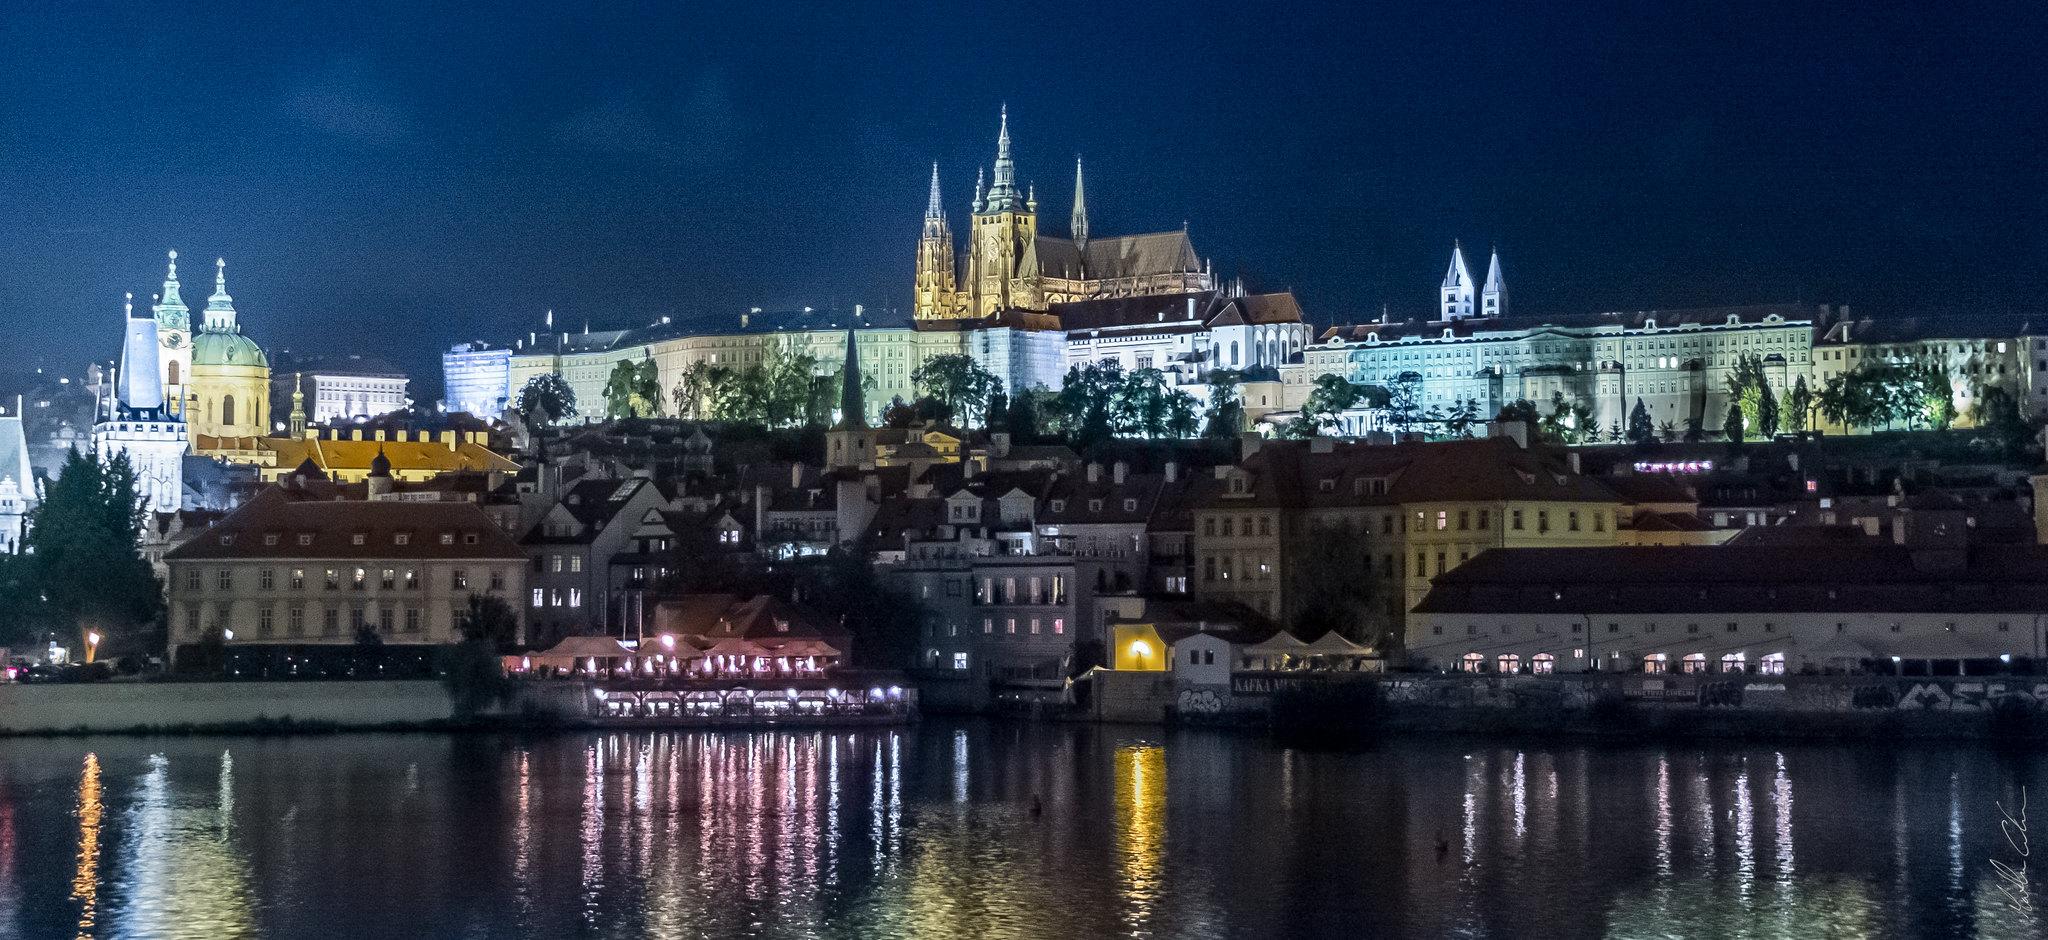 PragueVienneBudapest-Flickr-1